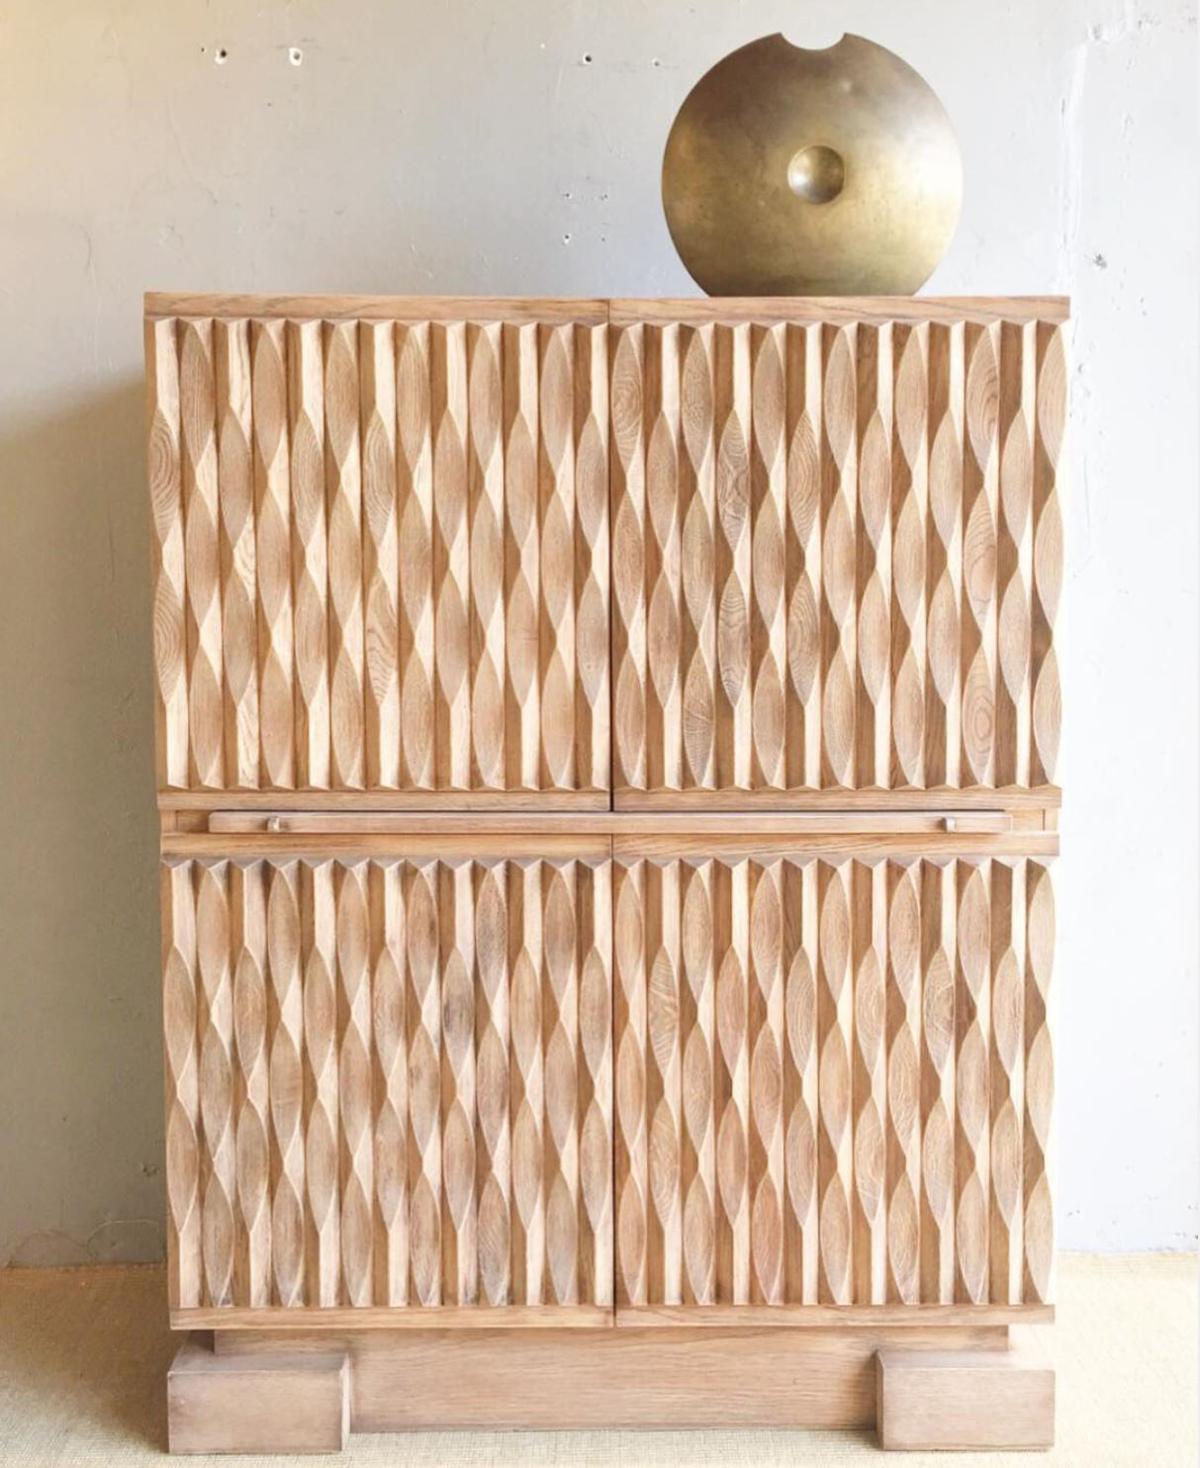 Amatoya showcases culturally inspired furniture line